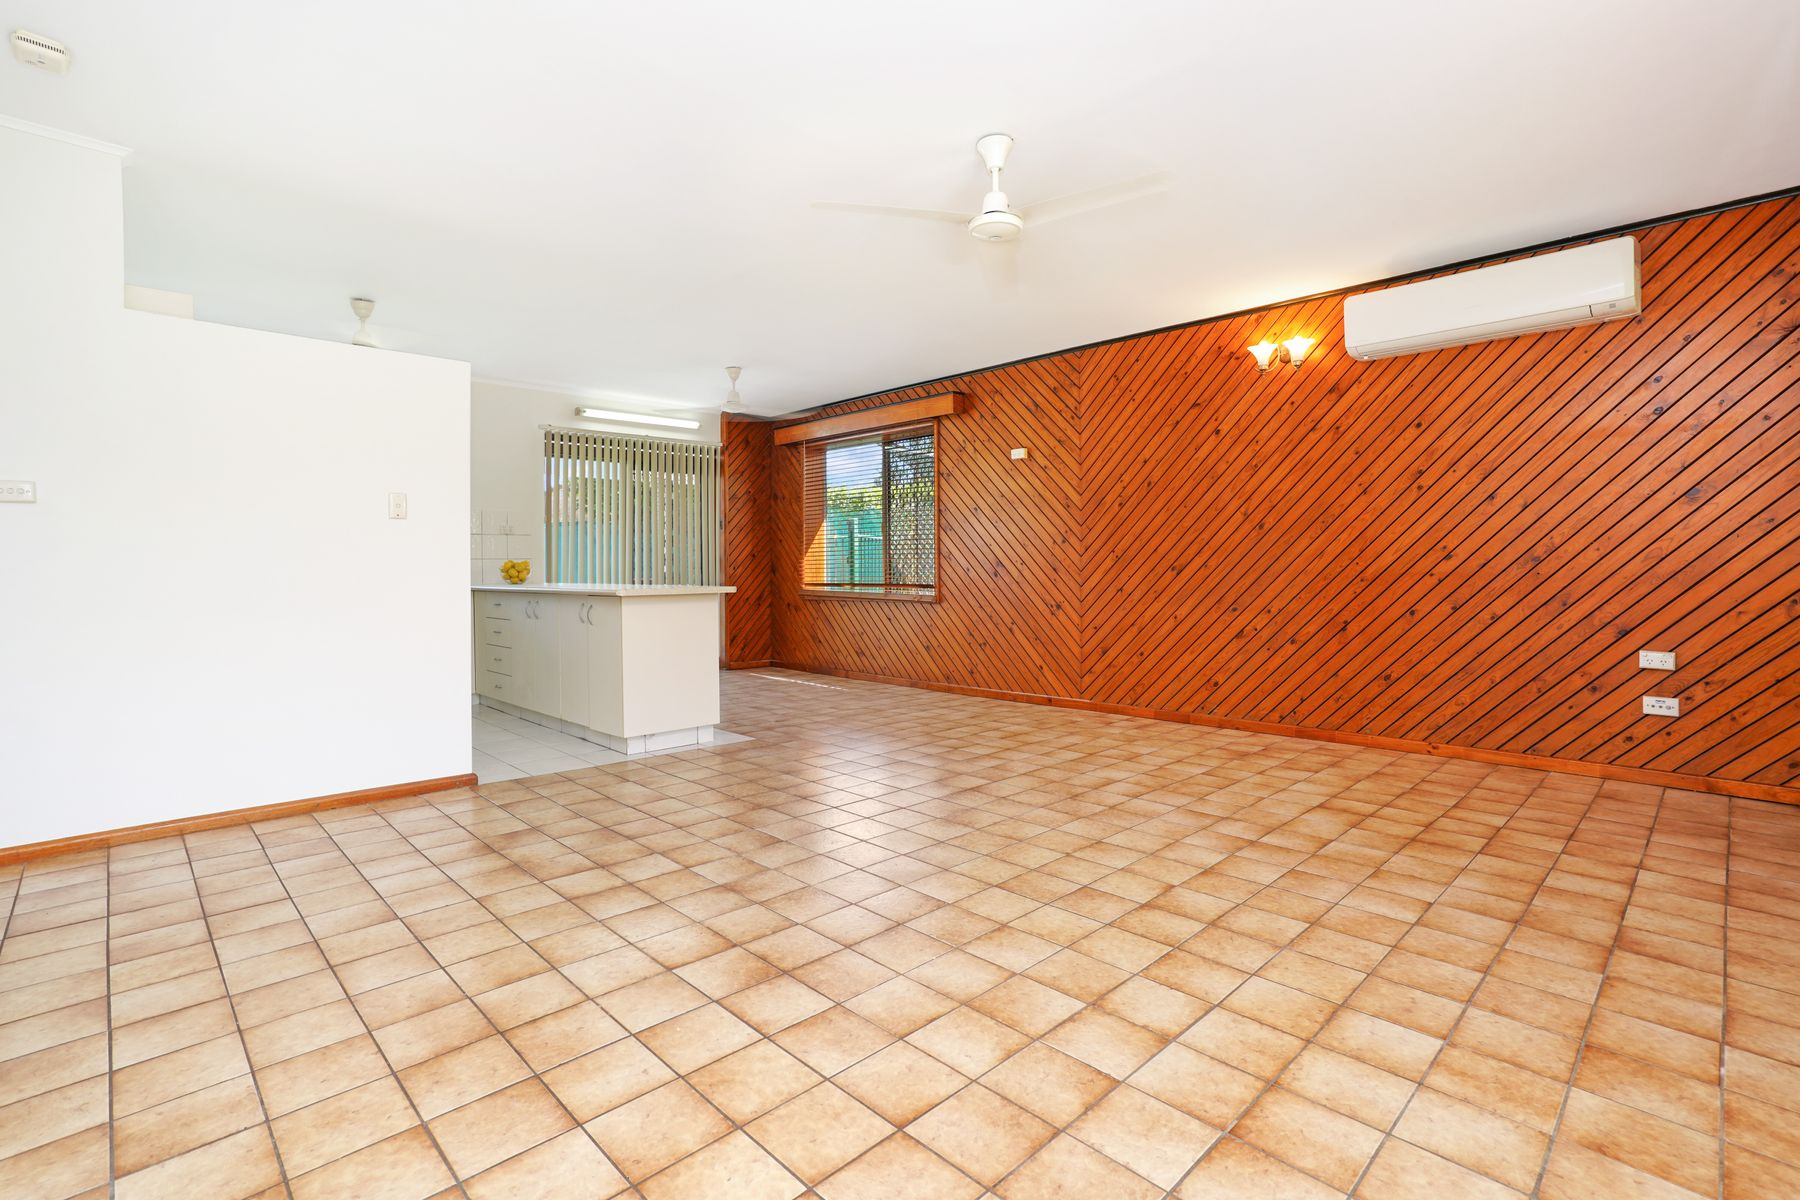 33 Copeland Crescent, Nakara, NT 0810